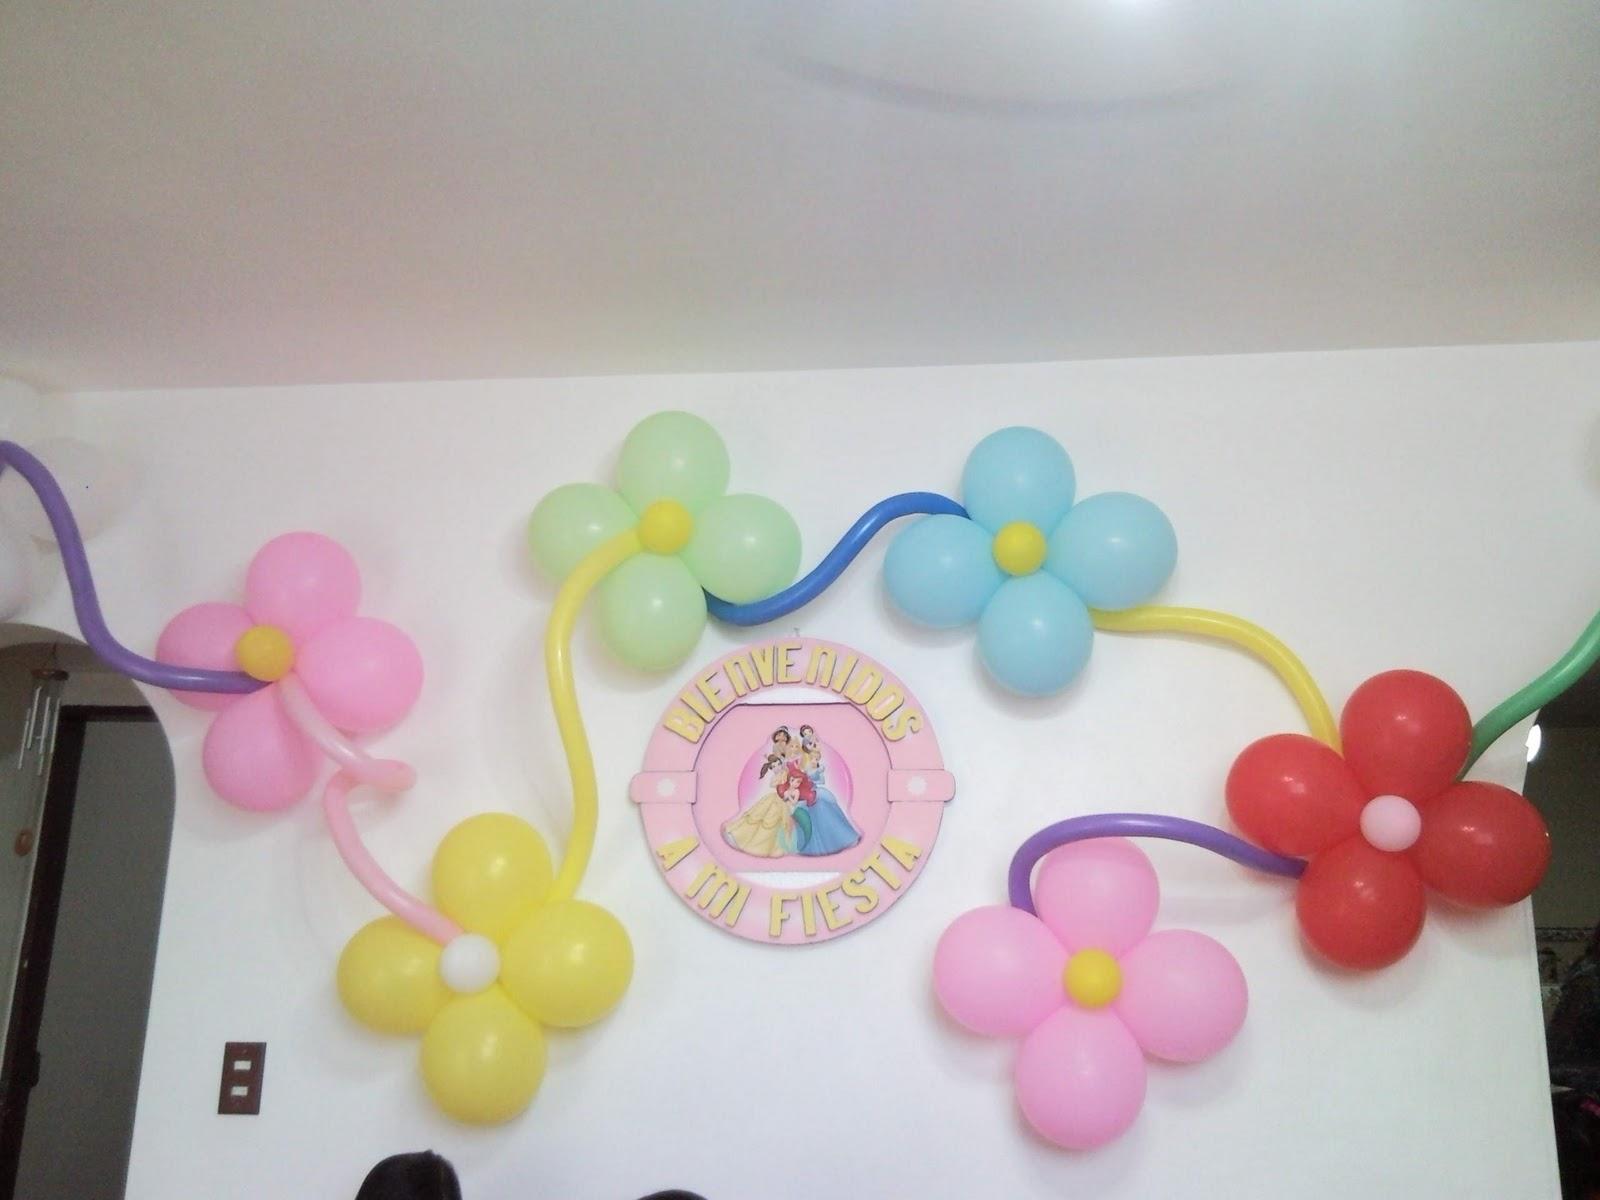 Decoracion de paredes con globos pictures to pin on for Decoracion de paredes